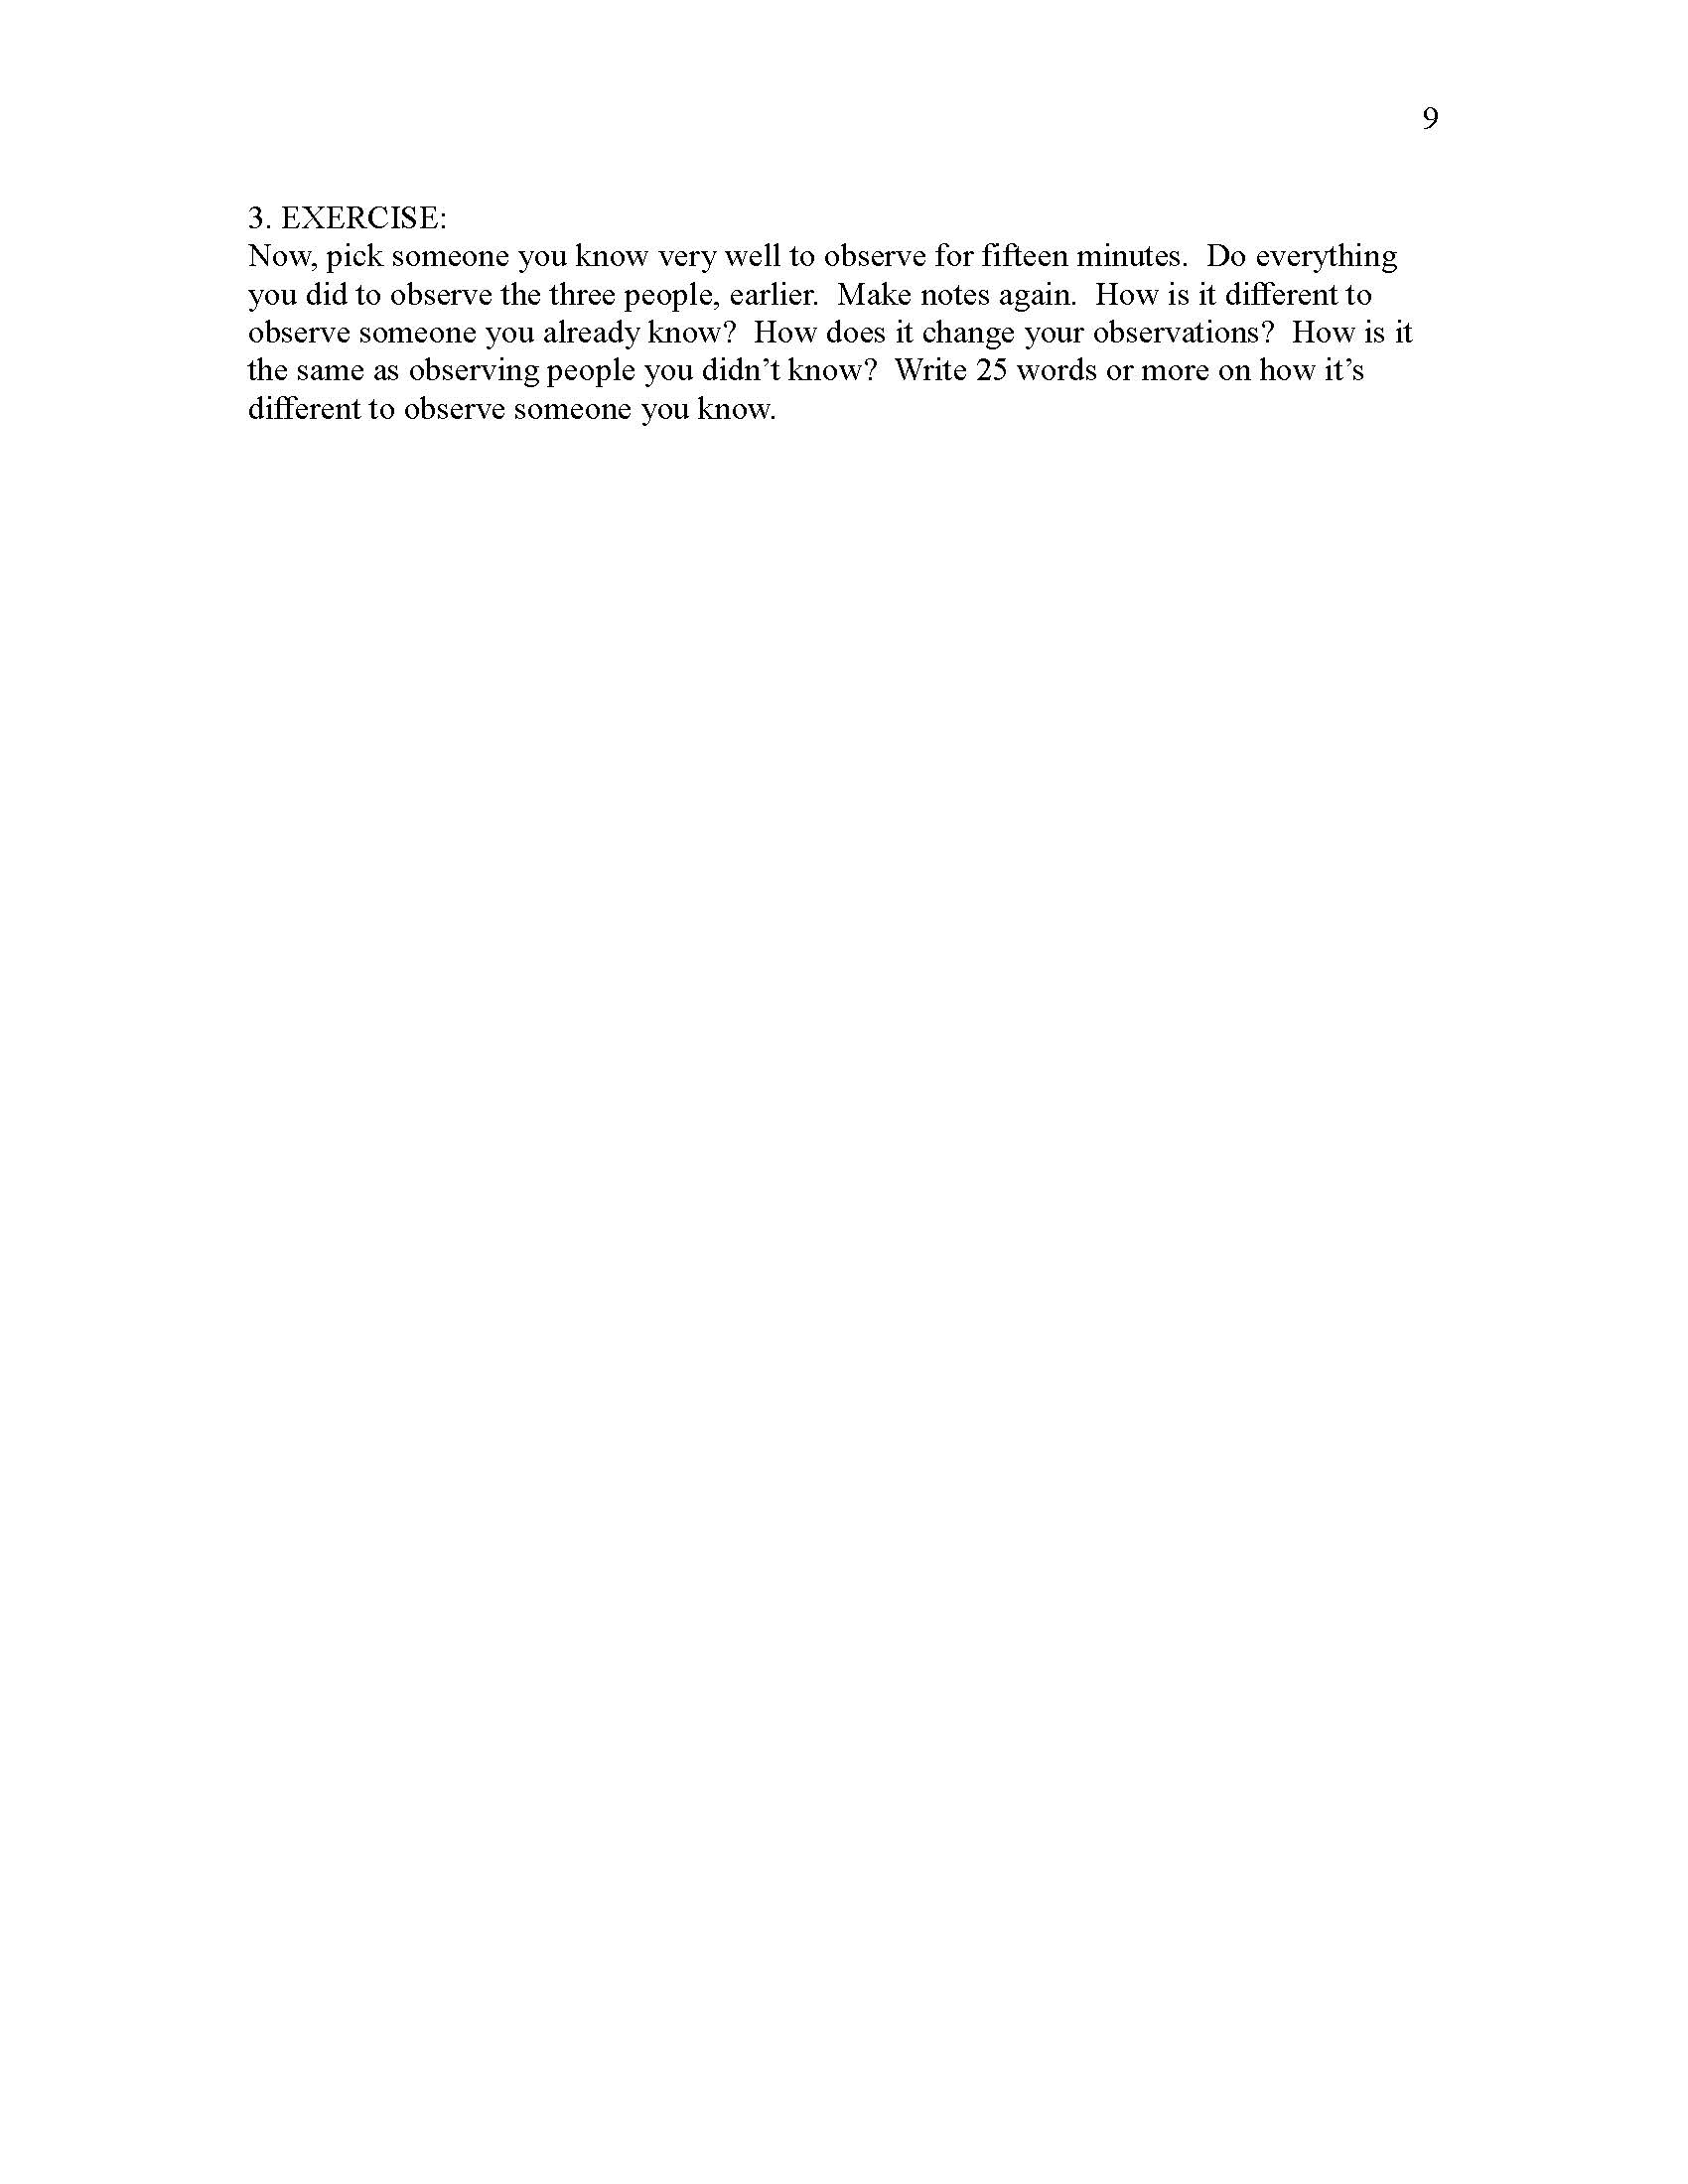 Samples Step 3 Science 1 - Science Basics_Page_10.jpg